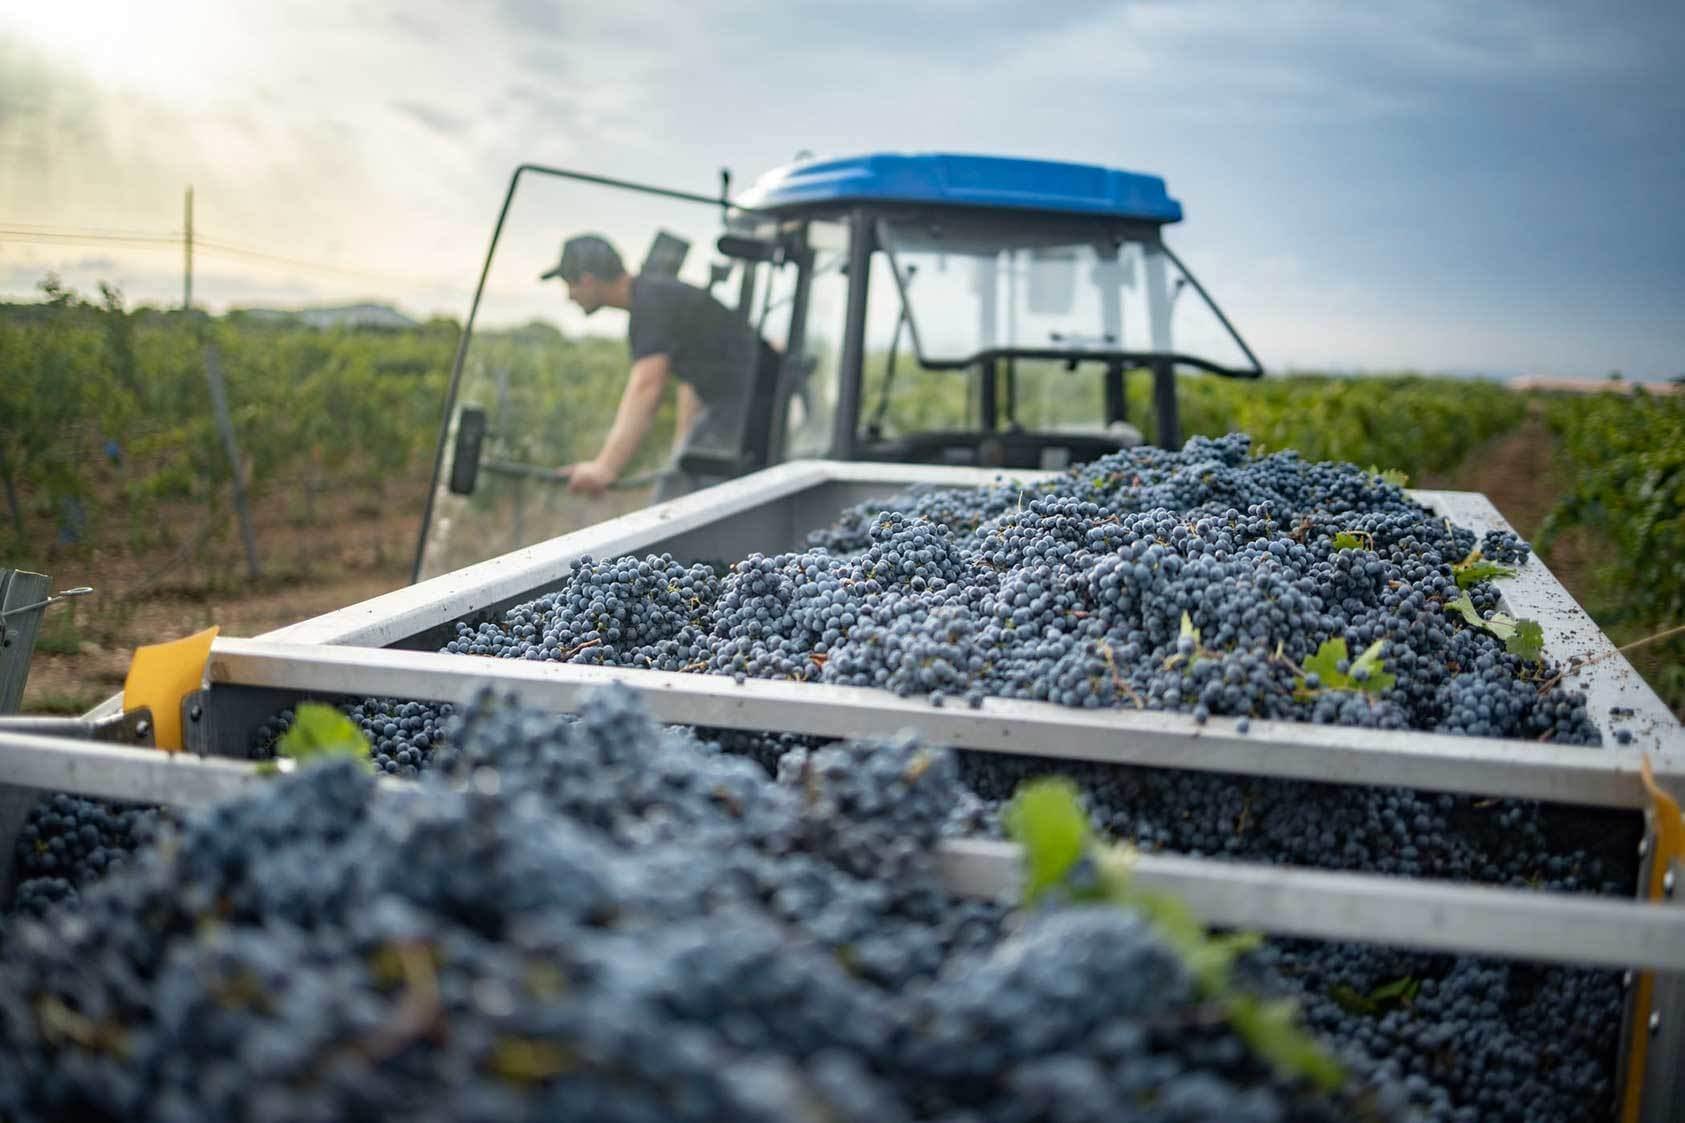 Blanca Terra Mallorca Majorca Wine Quality Original Qualitaet Original Wein Rotwein Weisswein Vino Calidad